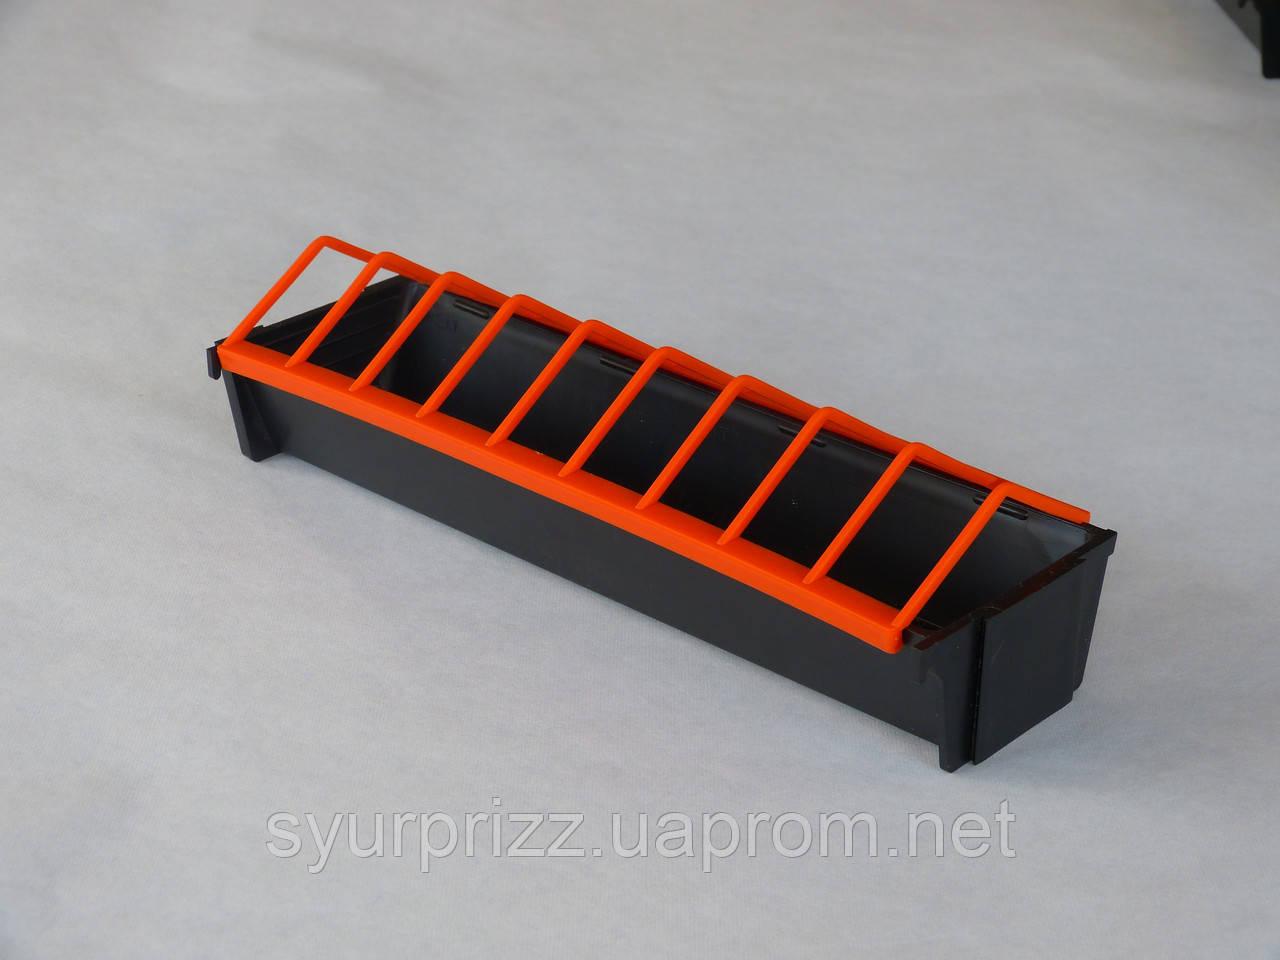 Кормушка лотковая для перепелов, цена 14 грн., купить в Харькове - Prom.ua (ID# 67787905)